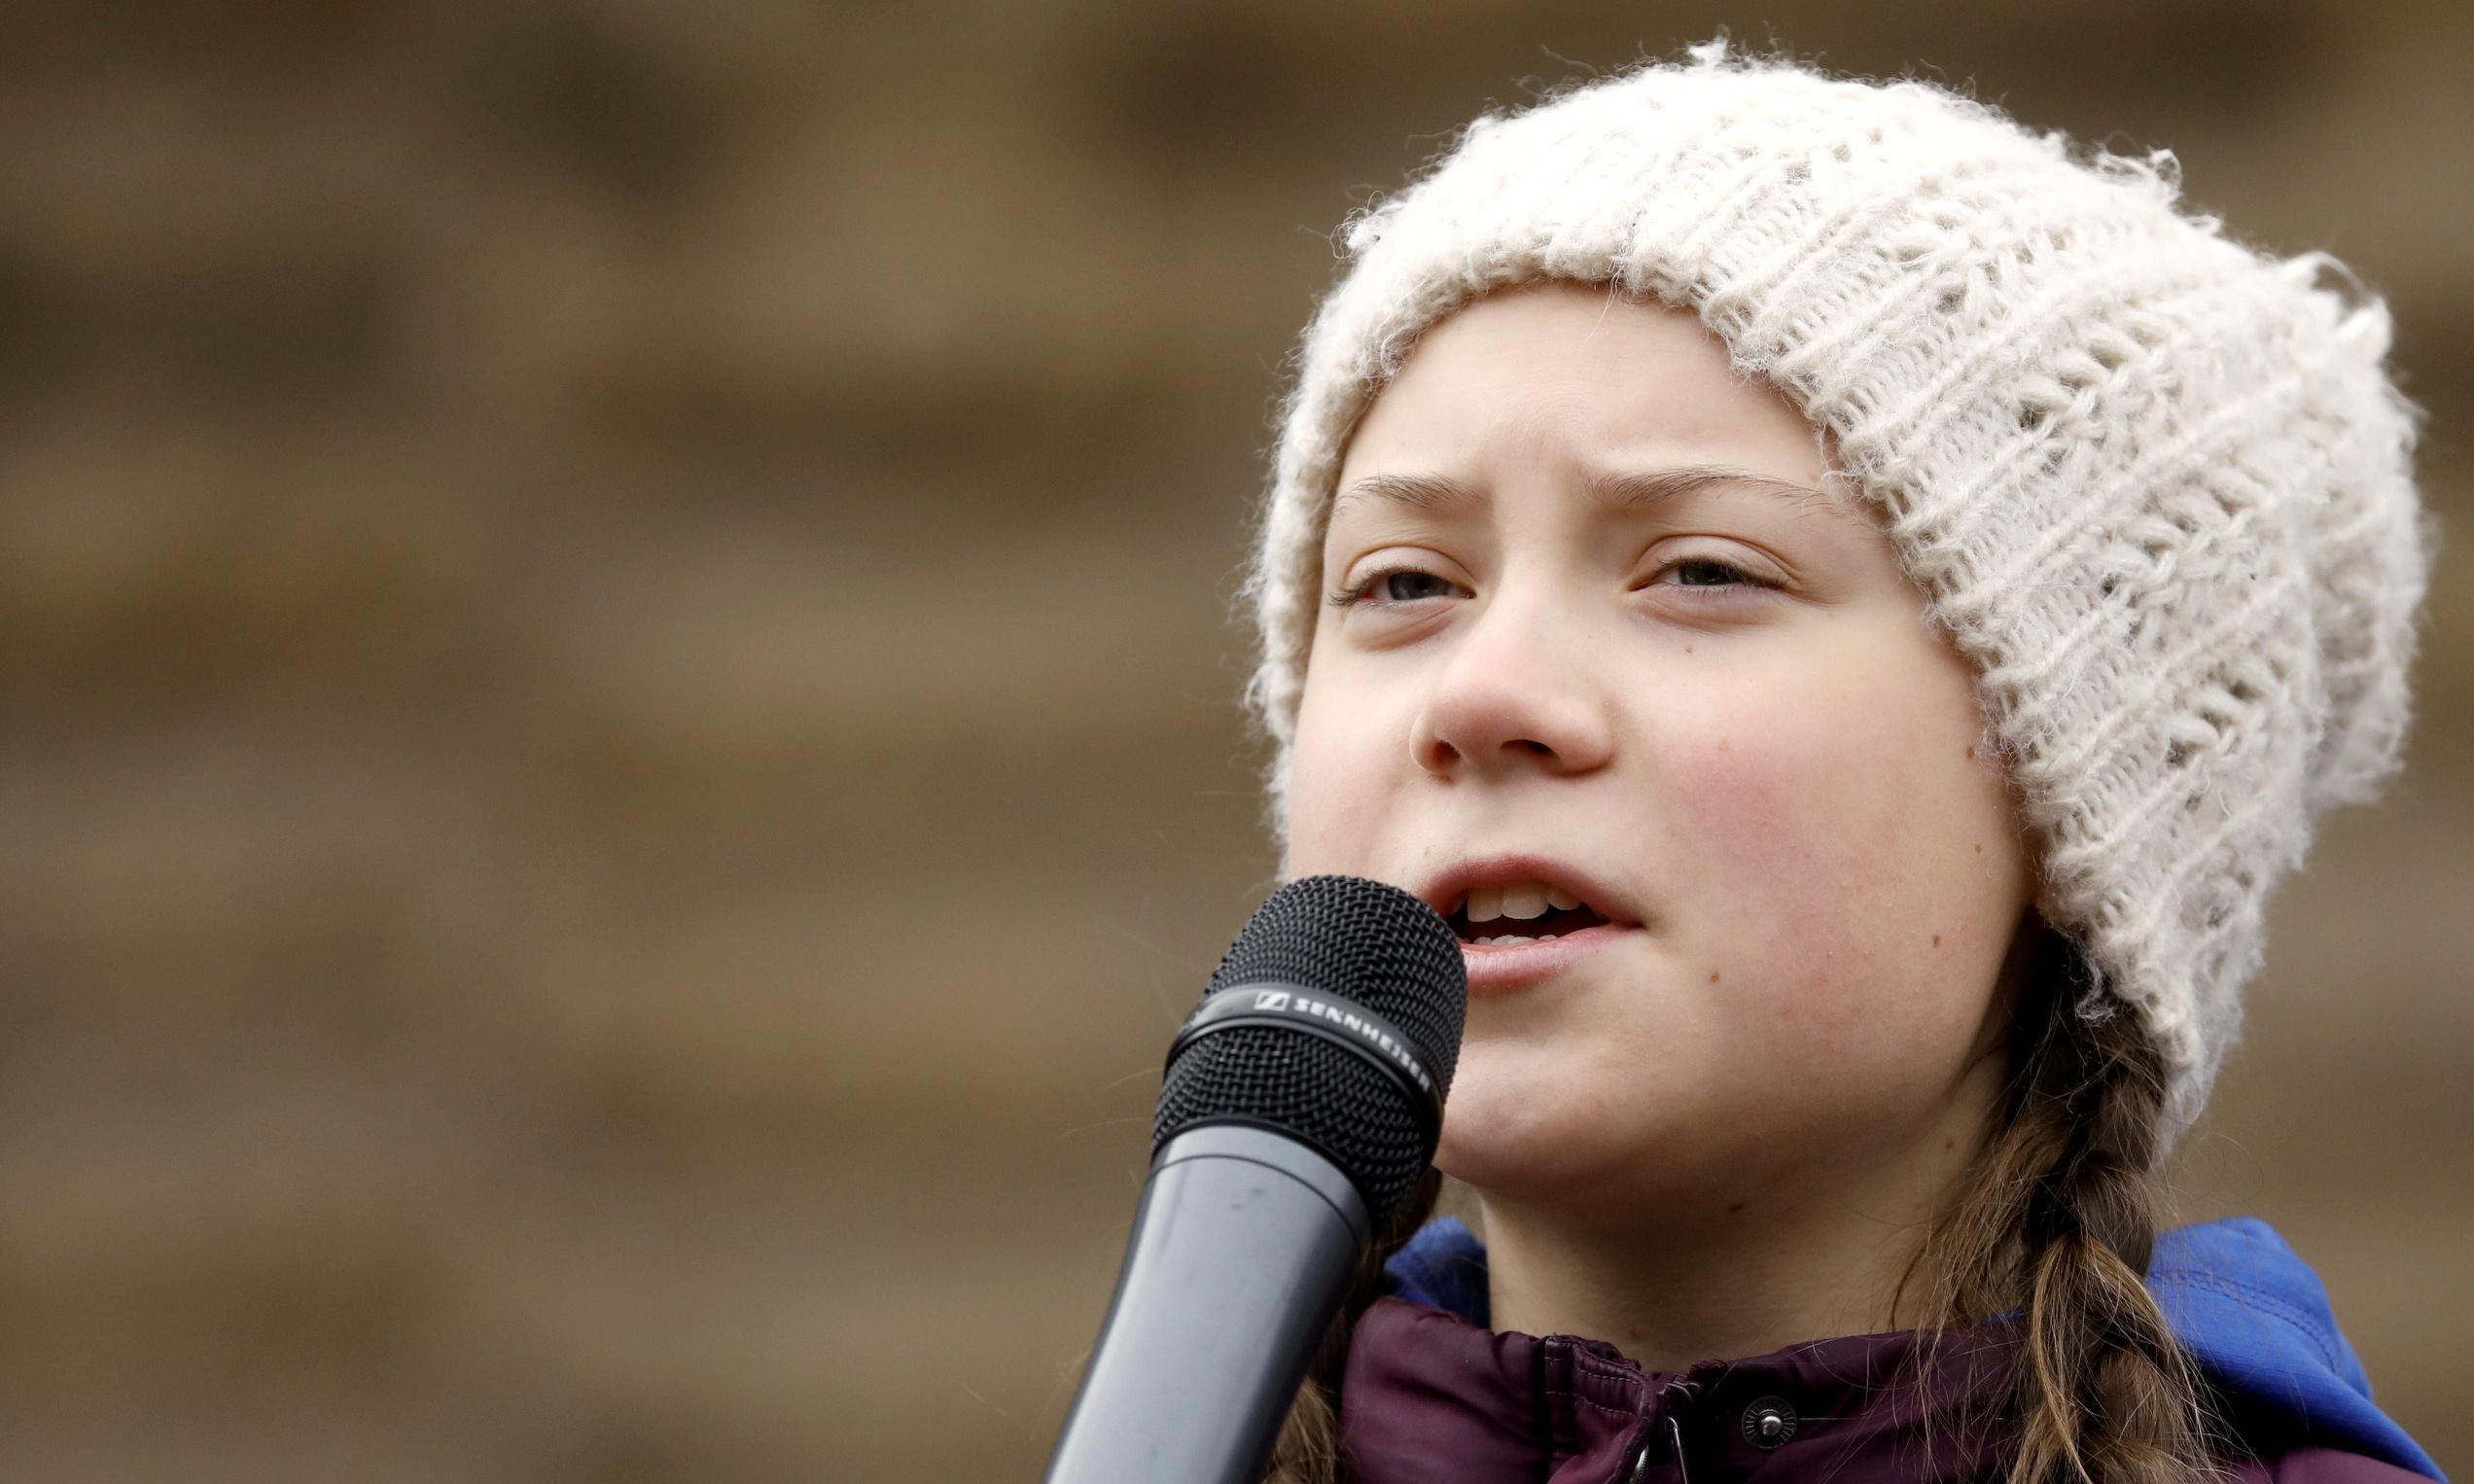 H 16χρονη Γκρέτα Τούνμπεργκ υποψήφια για το Νόμπελ